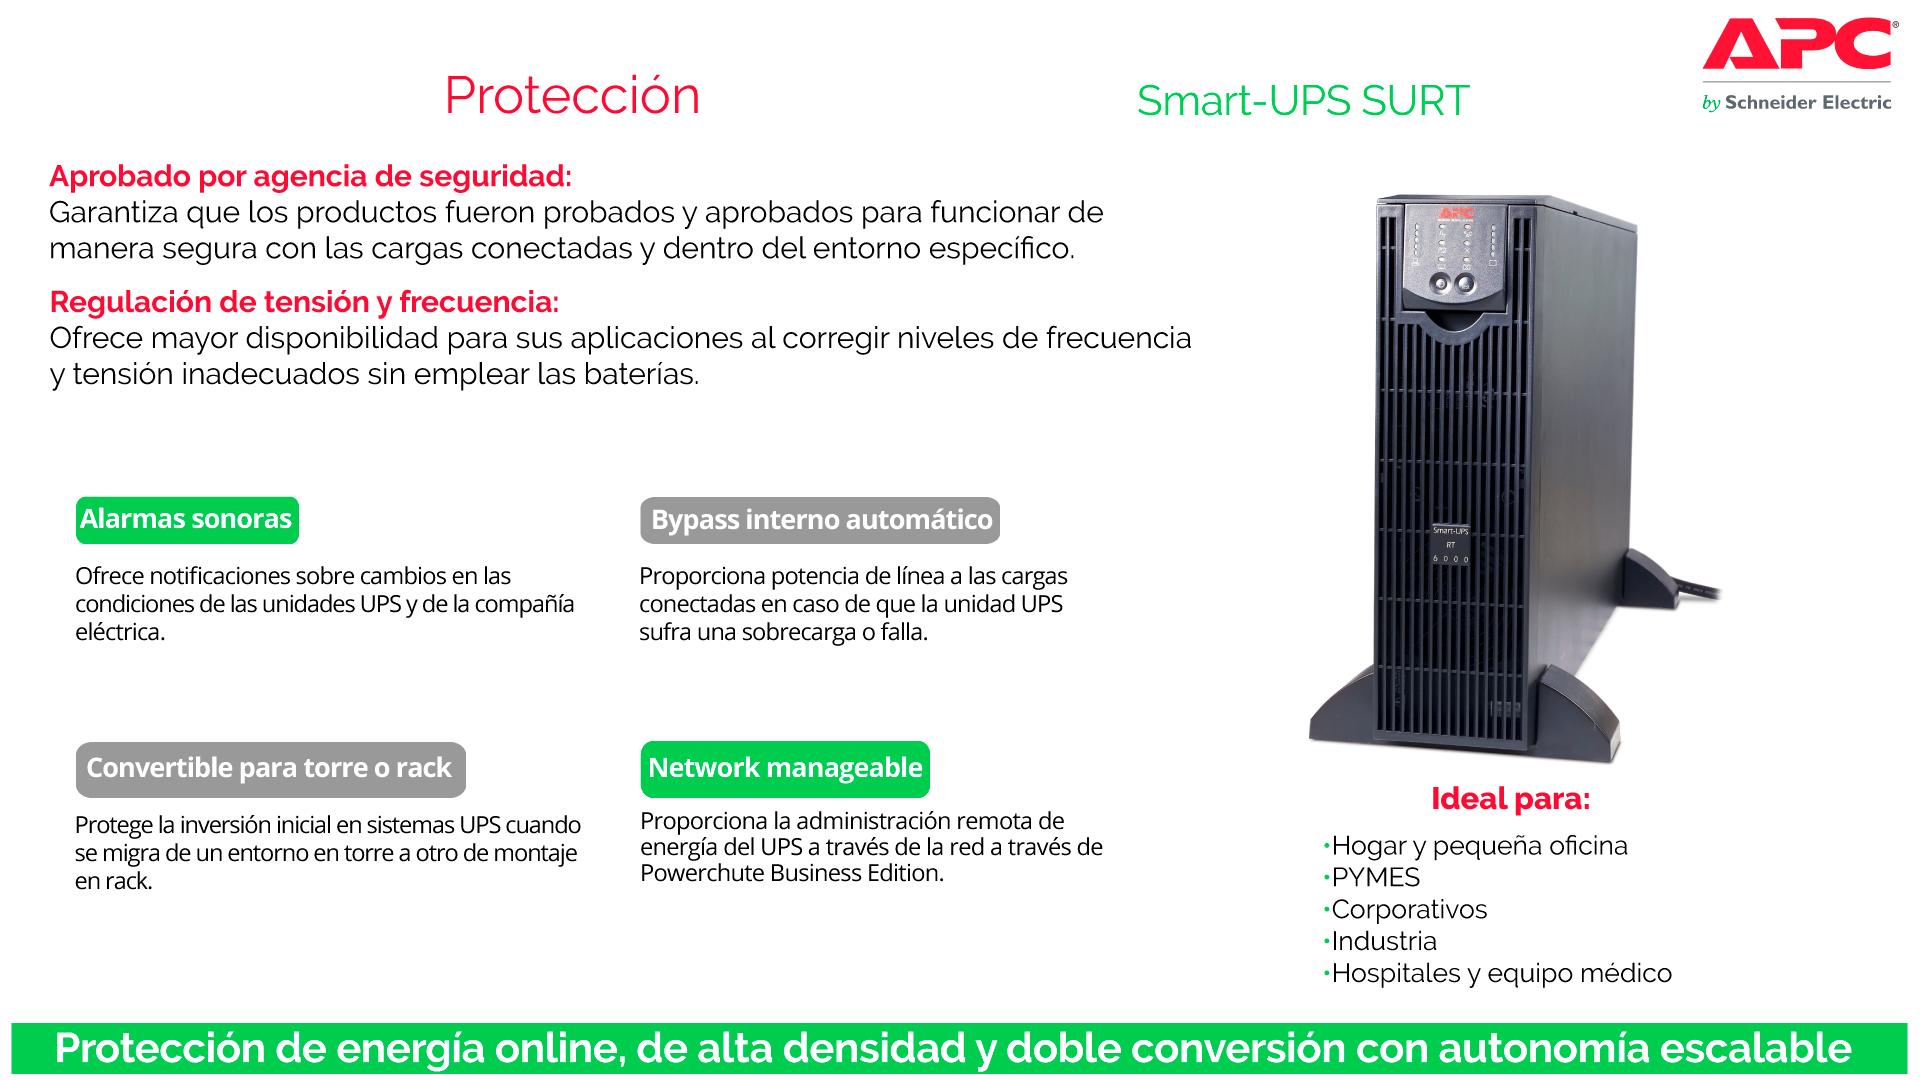 smartups SURT